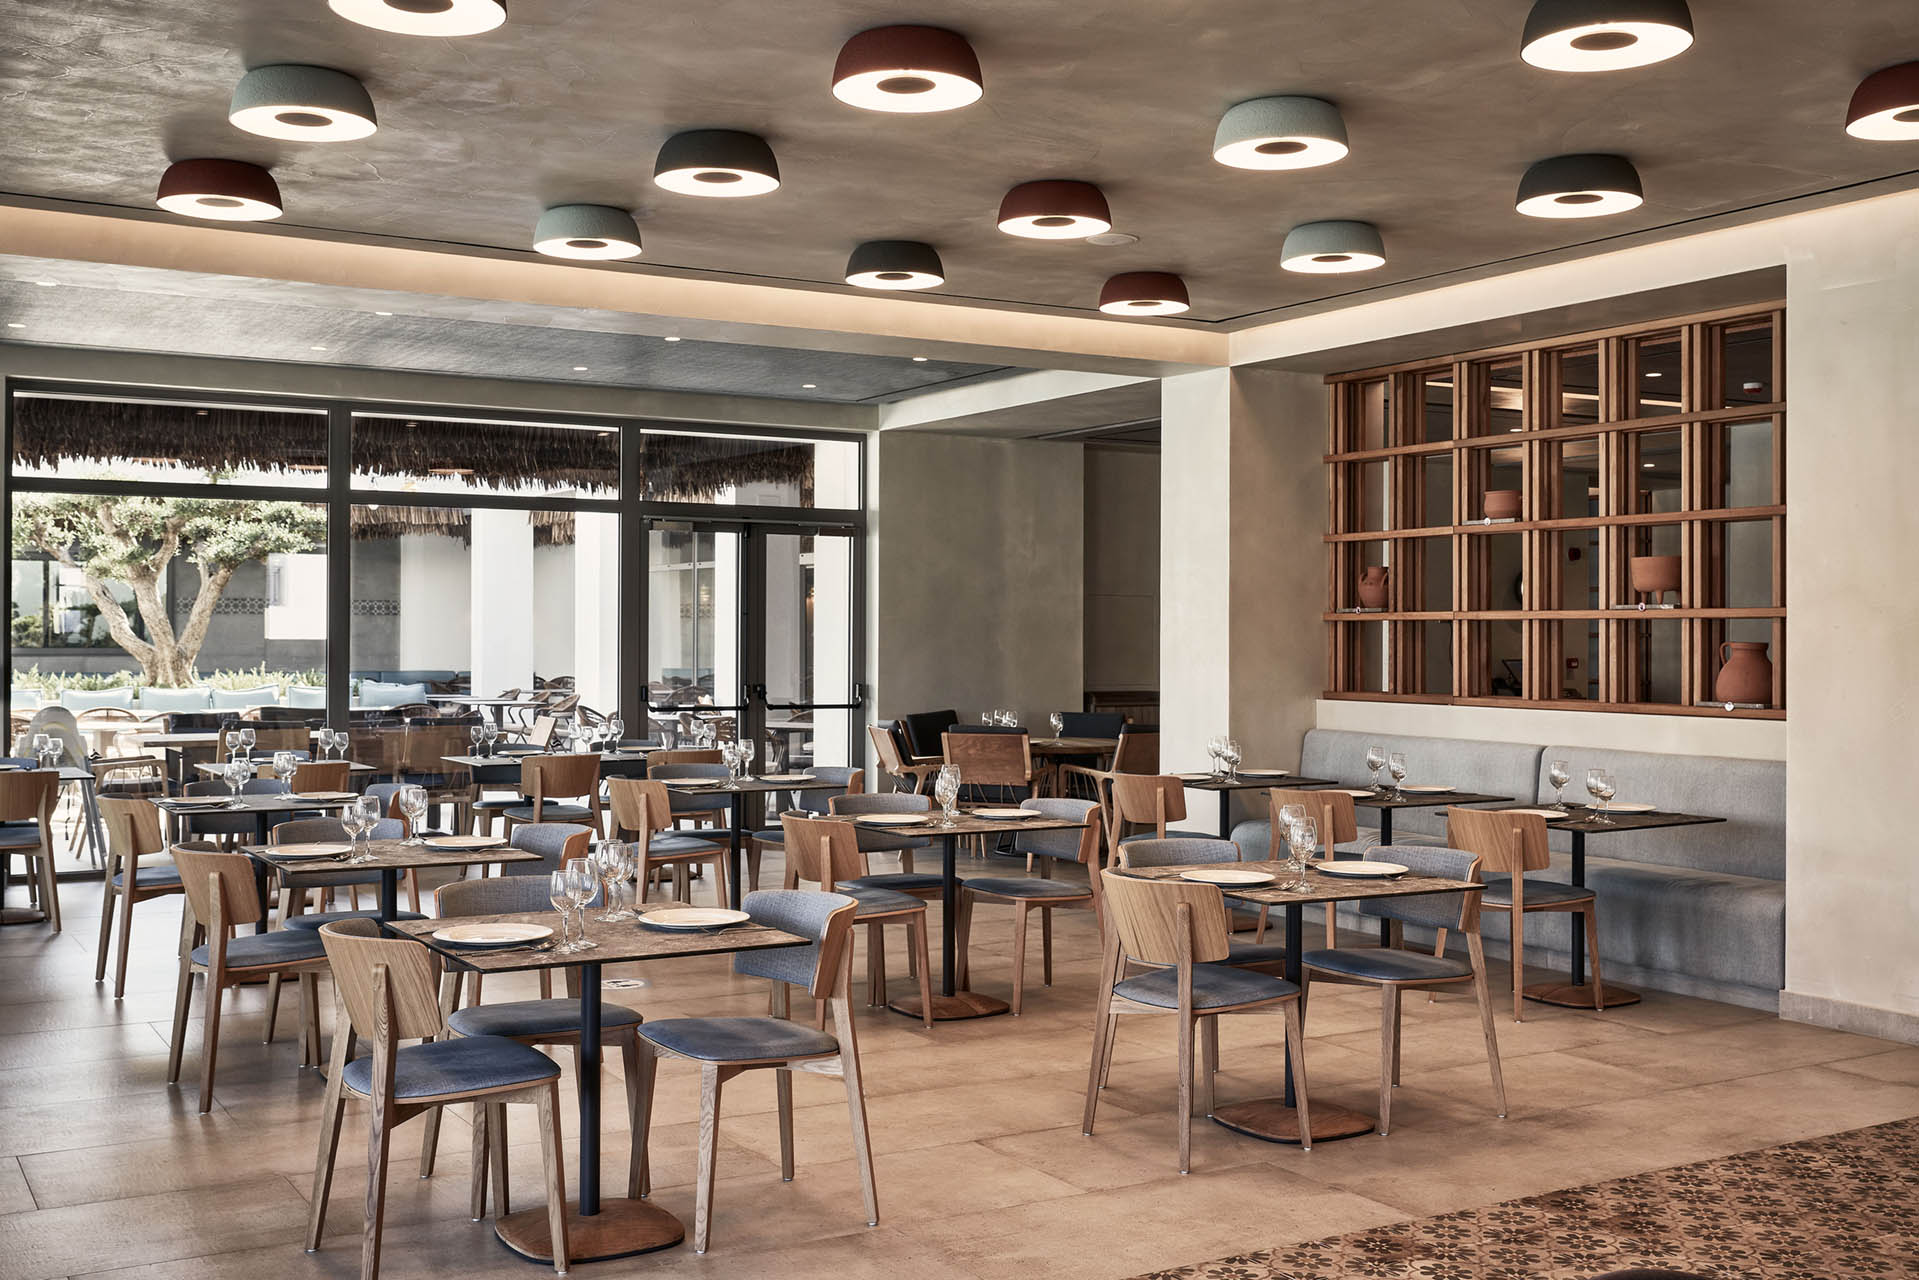 drz_atlantica-hotels-kos_27210